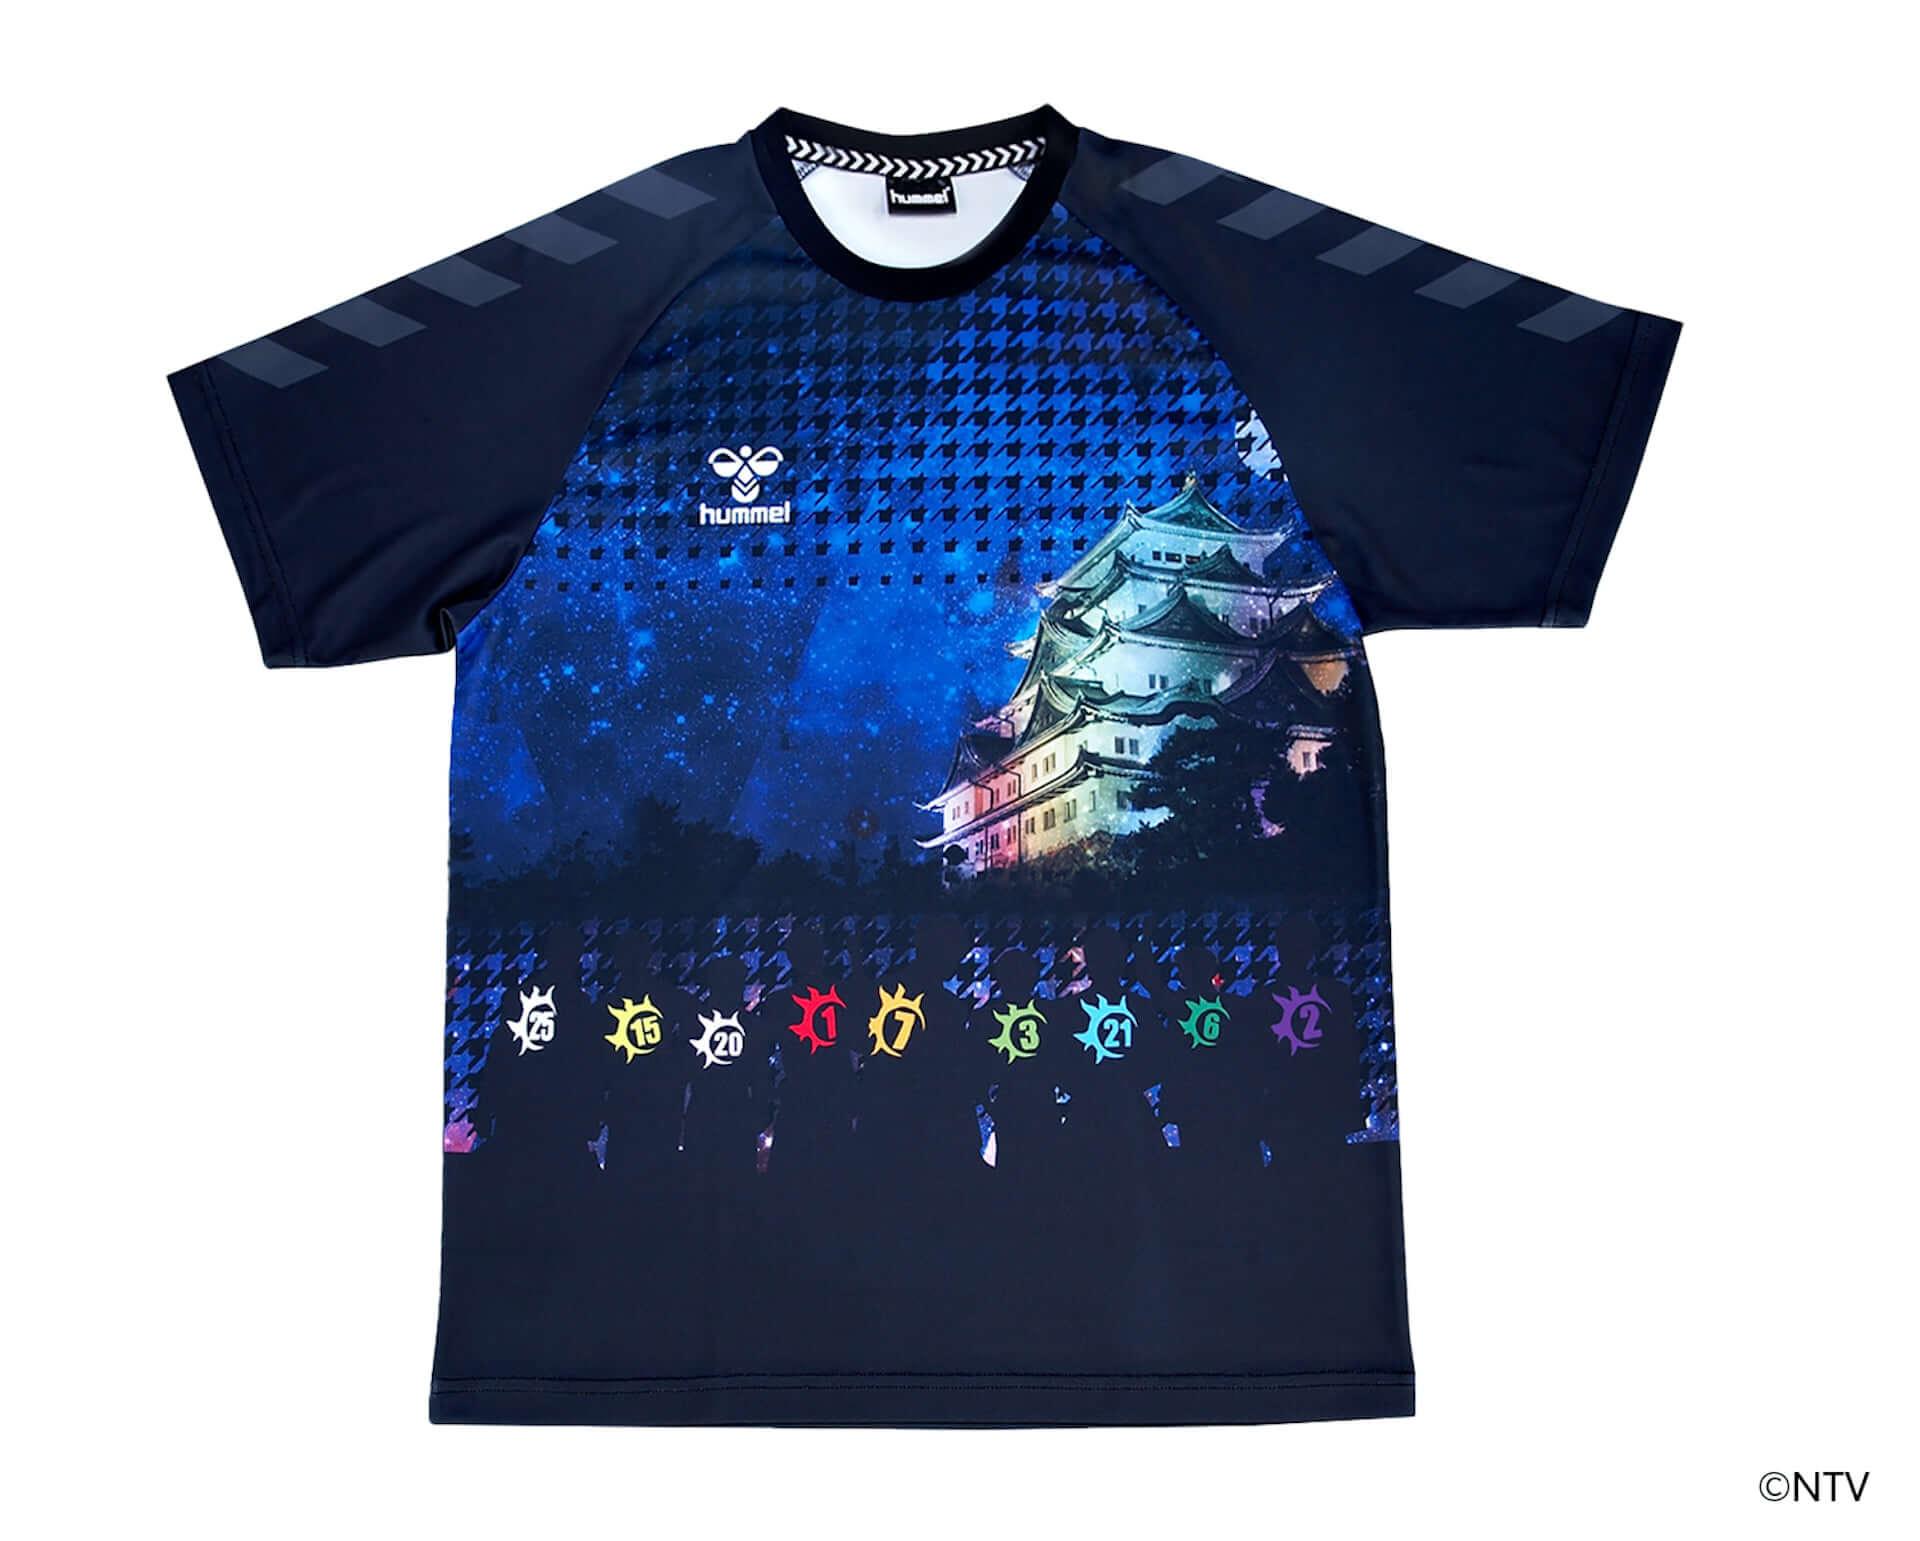 BOYS AND MEN結成10周年記念!辻本達規、田村侑久、ヒュンメルによるコラボTシャツ&ジャージが発売 lf201228_hummel_17-1920x1541